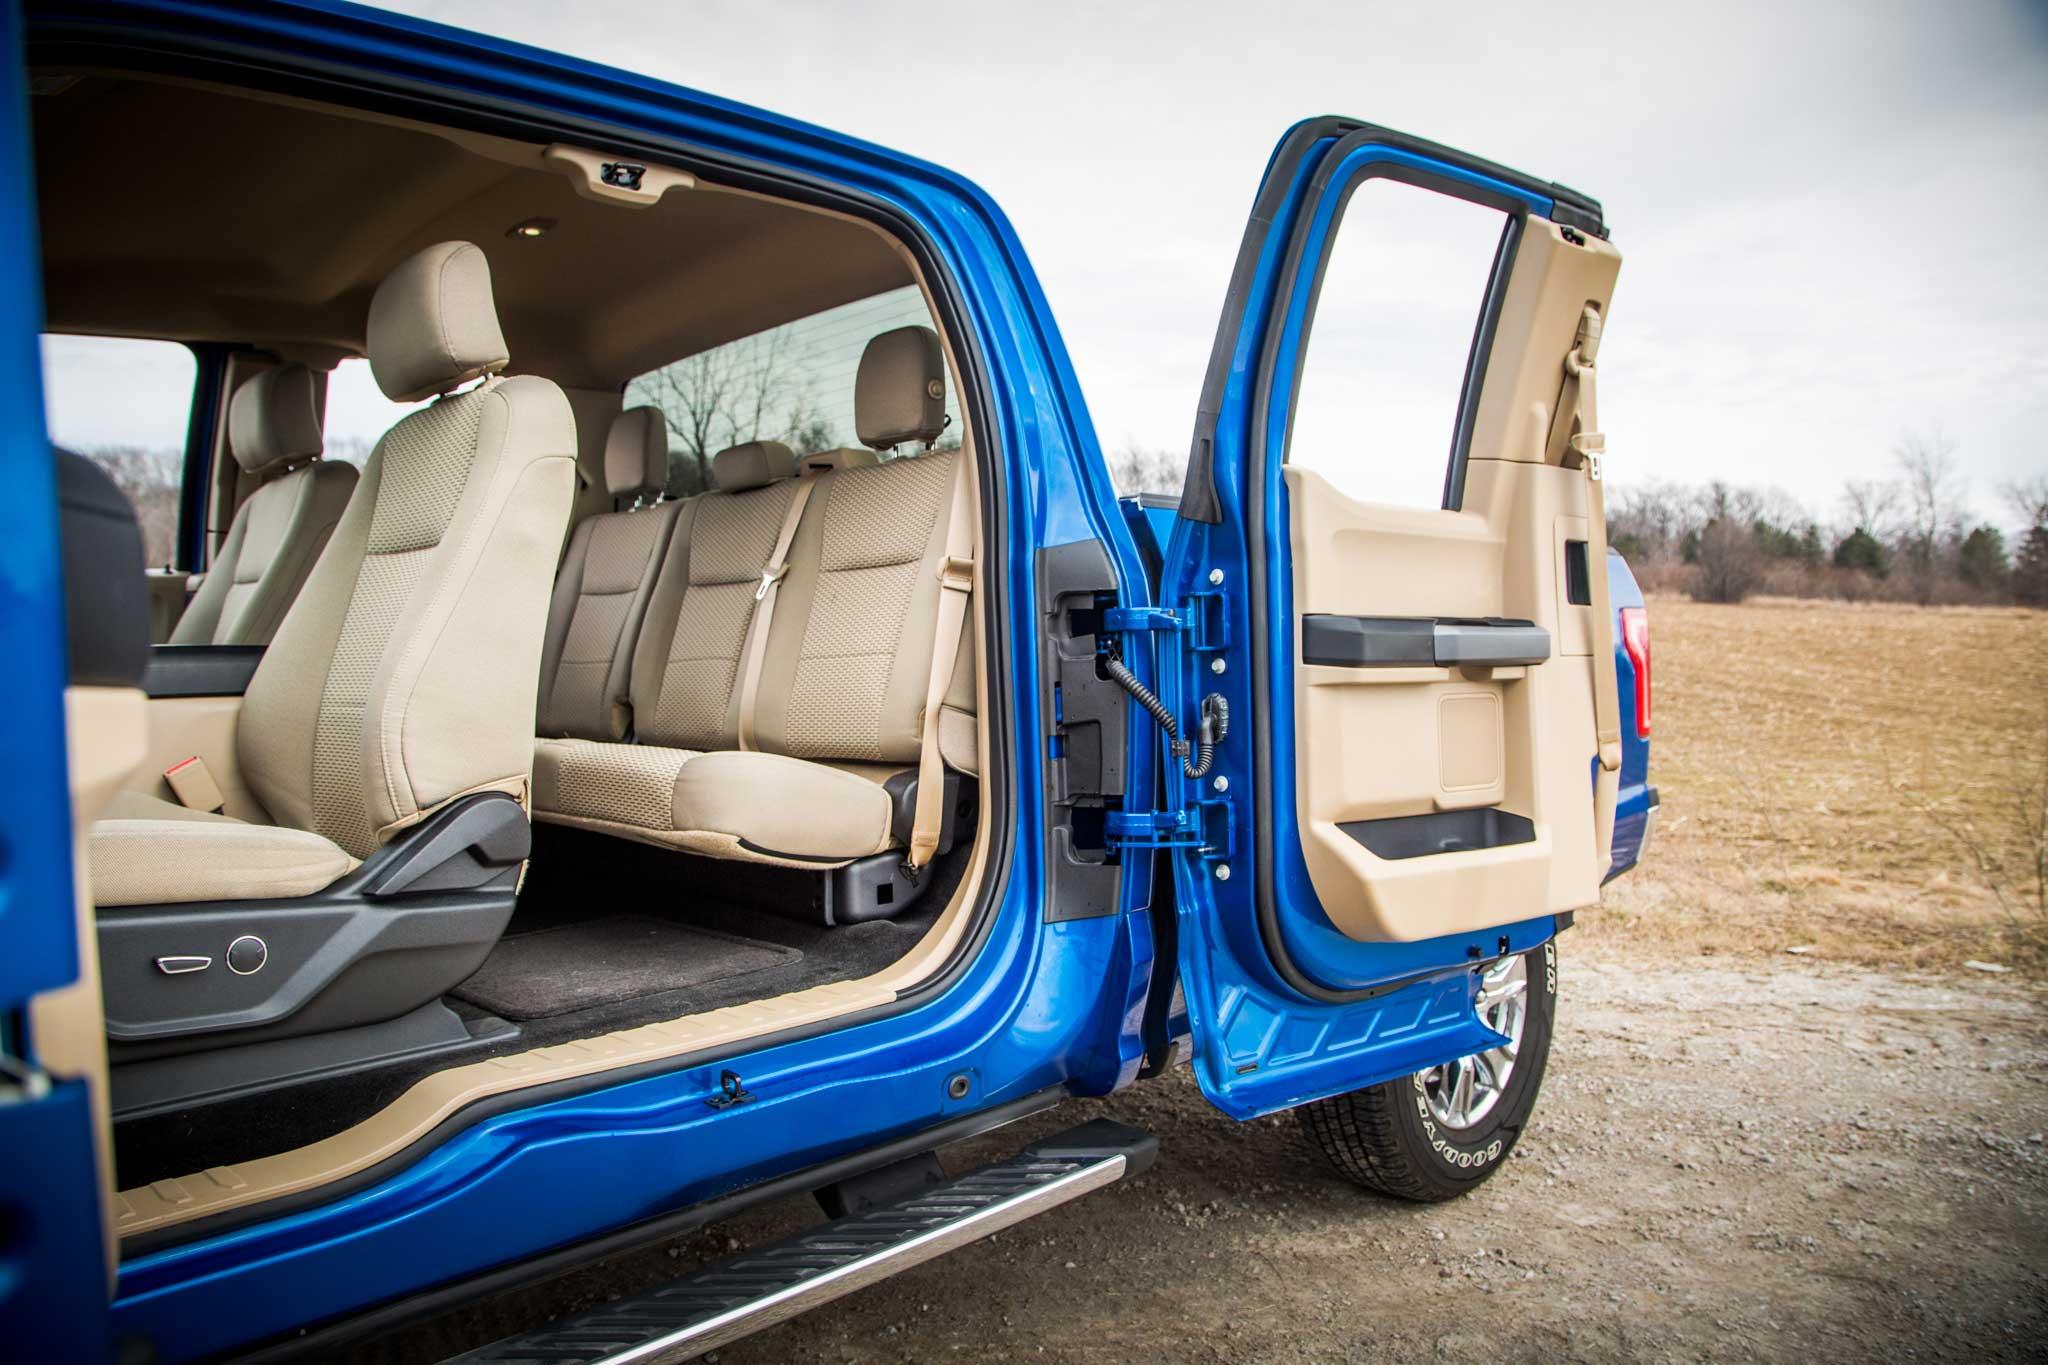 2015-ford-f-150-suicide-door & 2015-ford-f-150-suicide-door - Lowrider